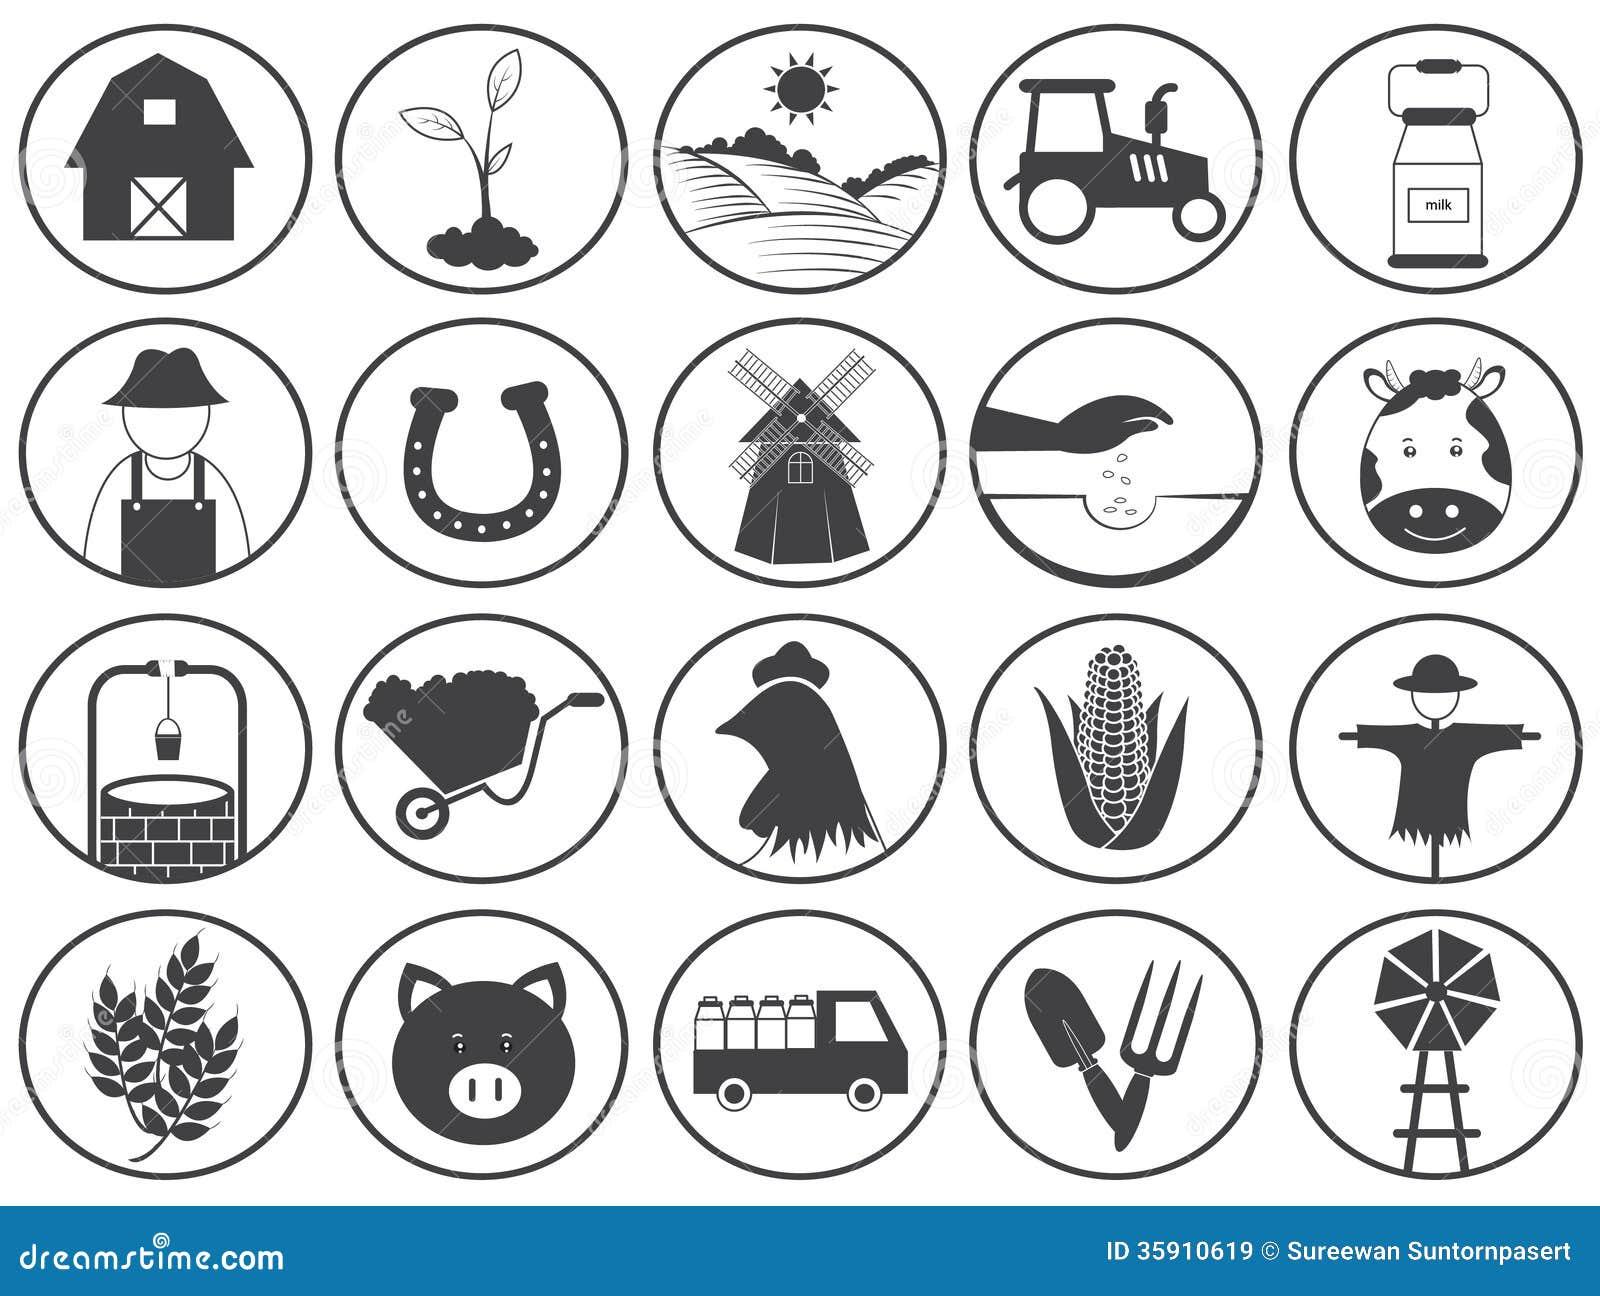 Farming Icons Vector Collection Stock Vector - Image: 35910619